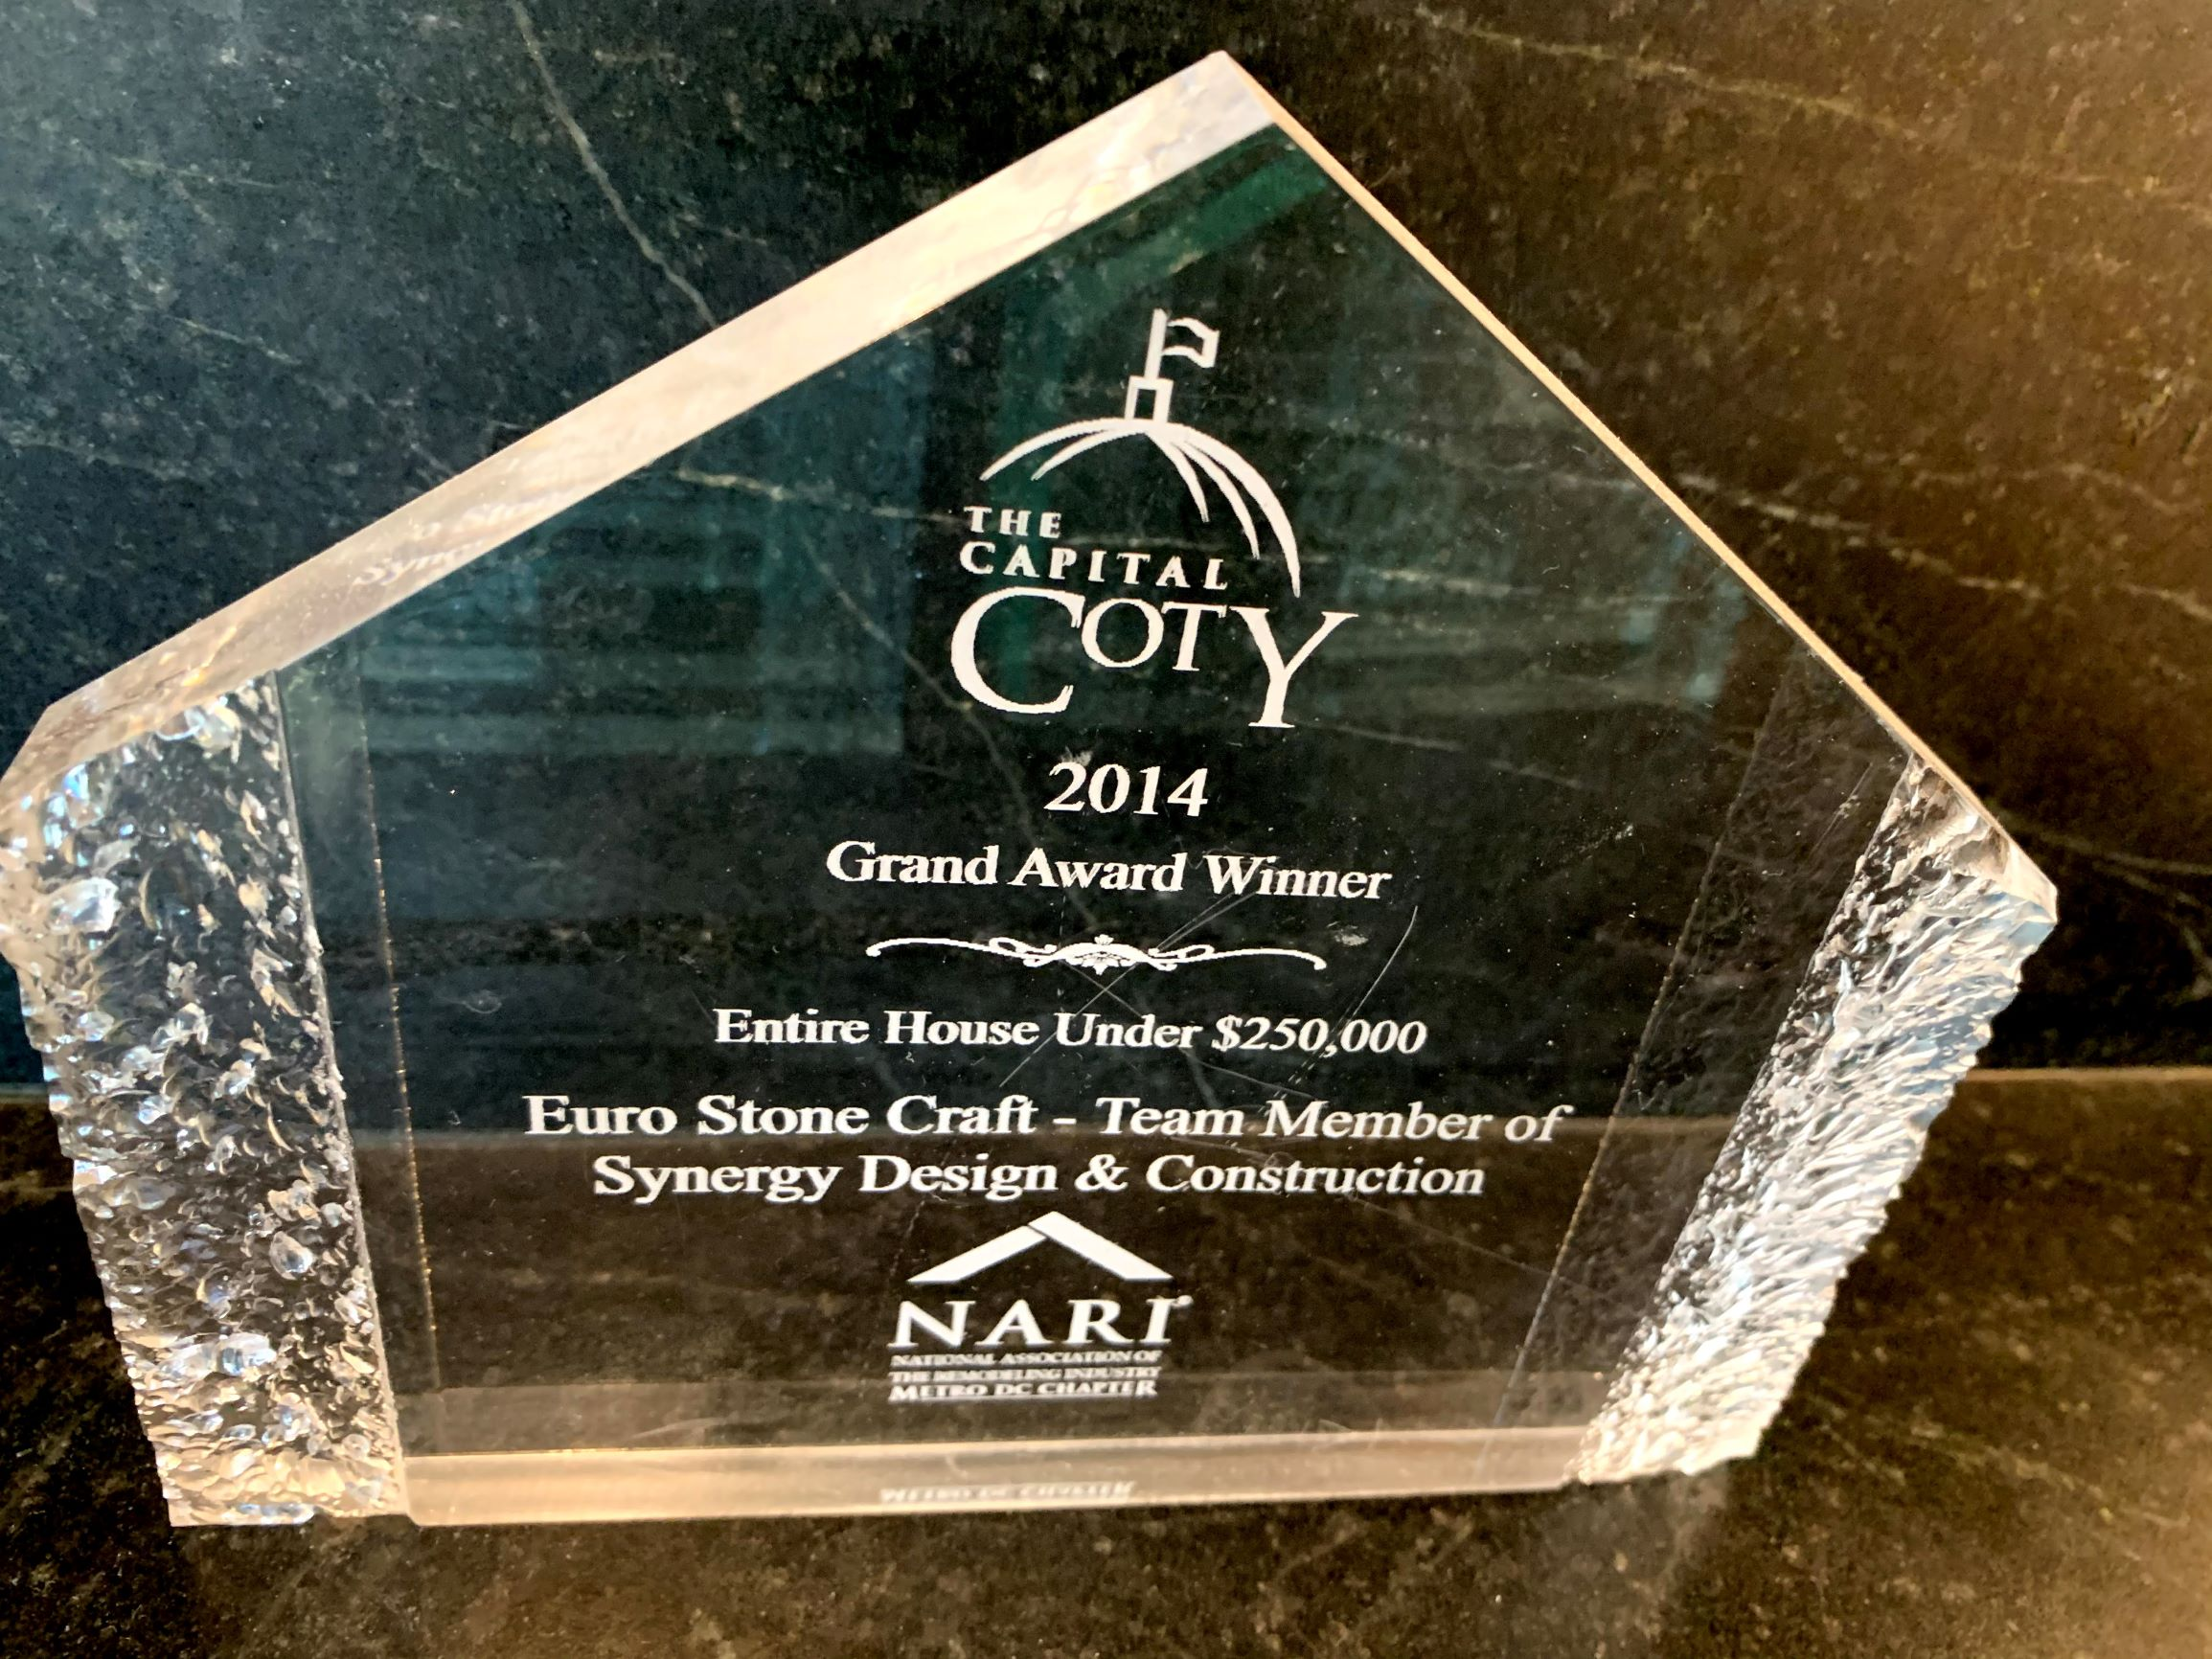 ESC Coty Award 2014 Entire House